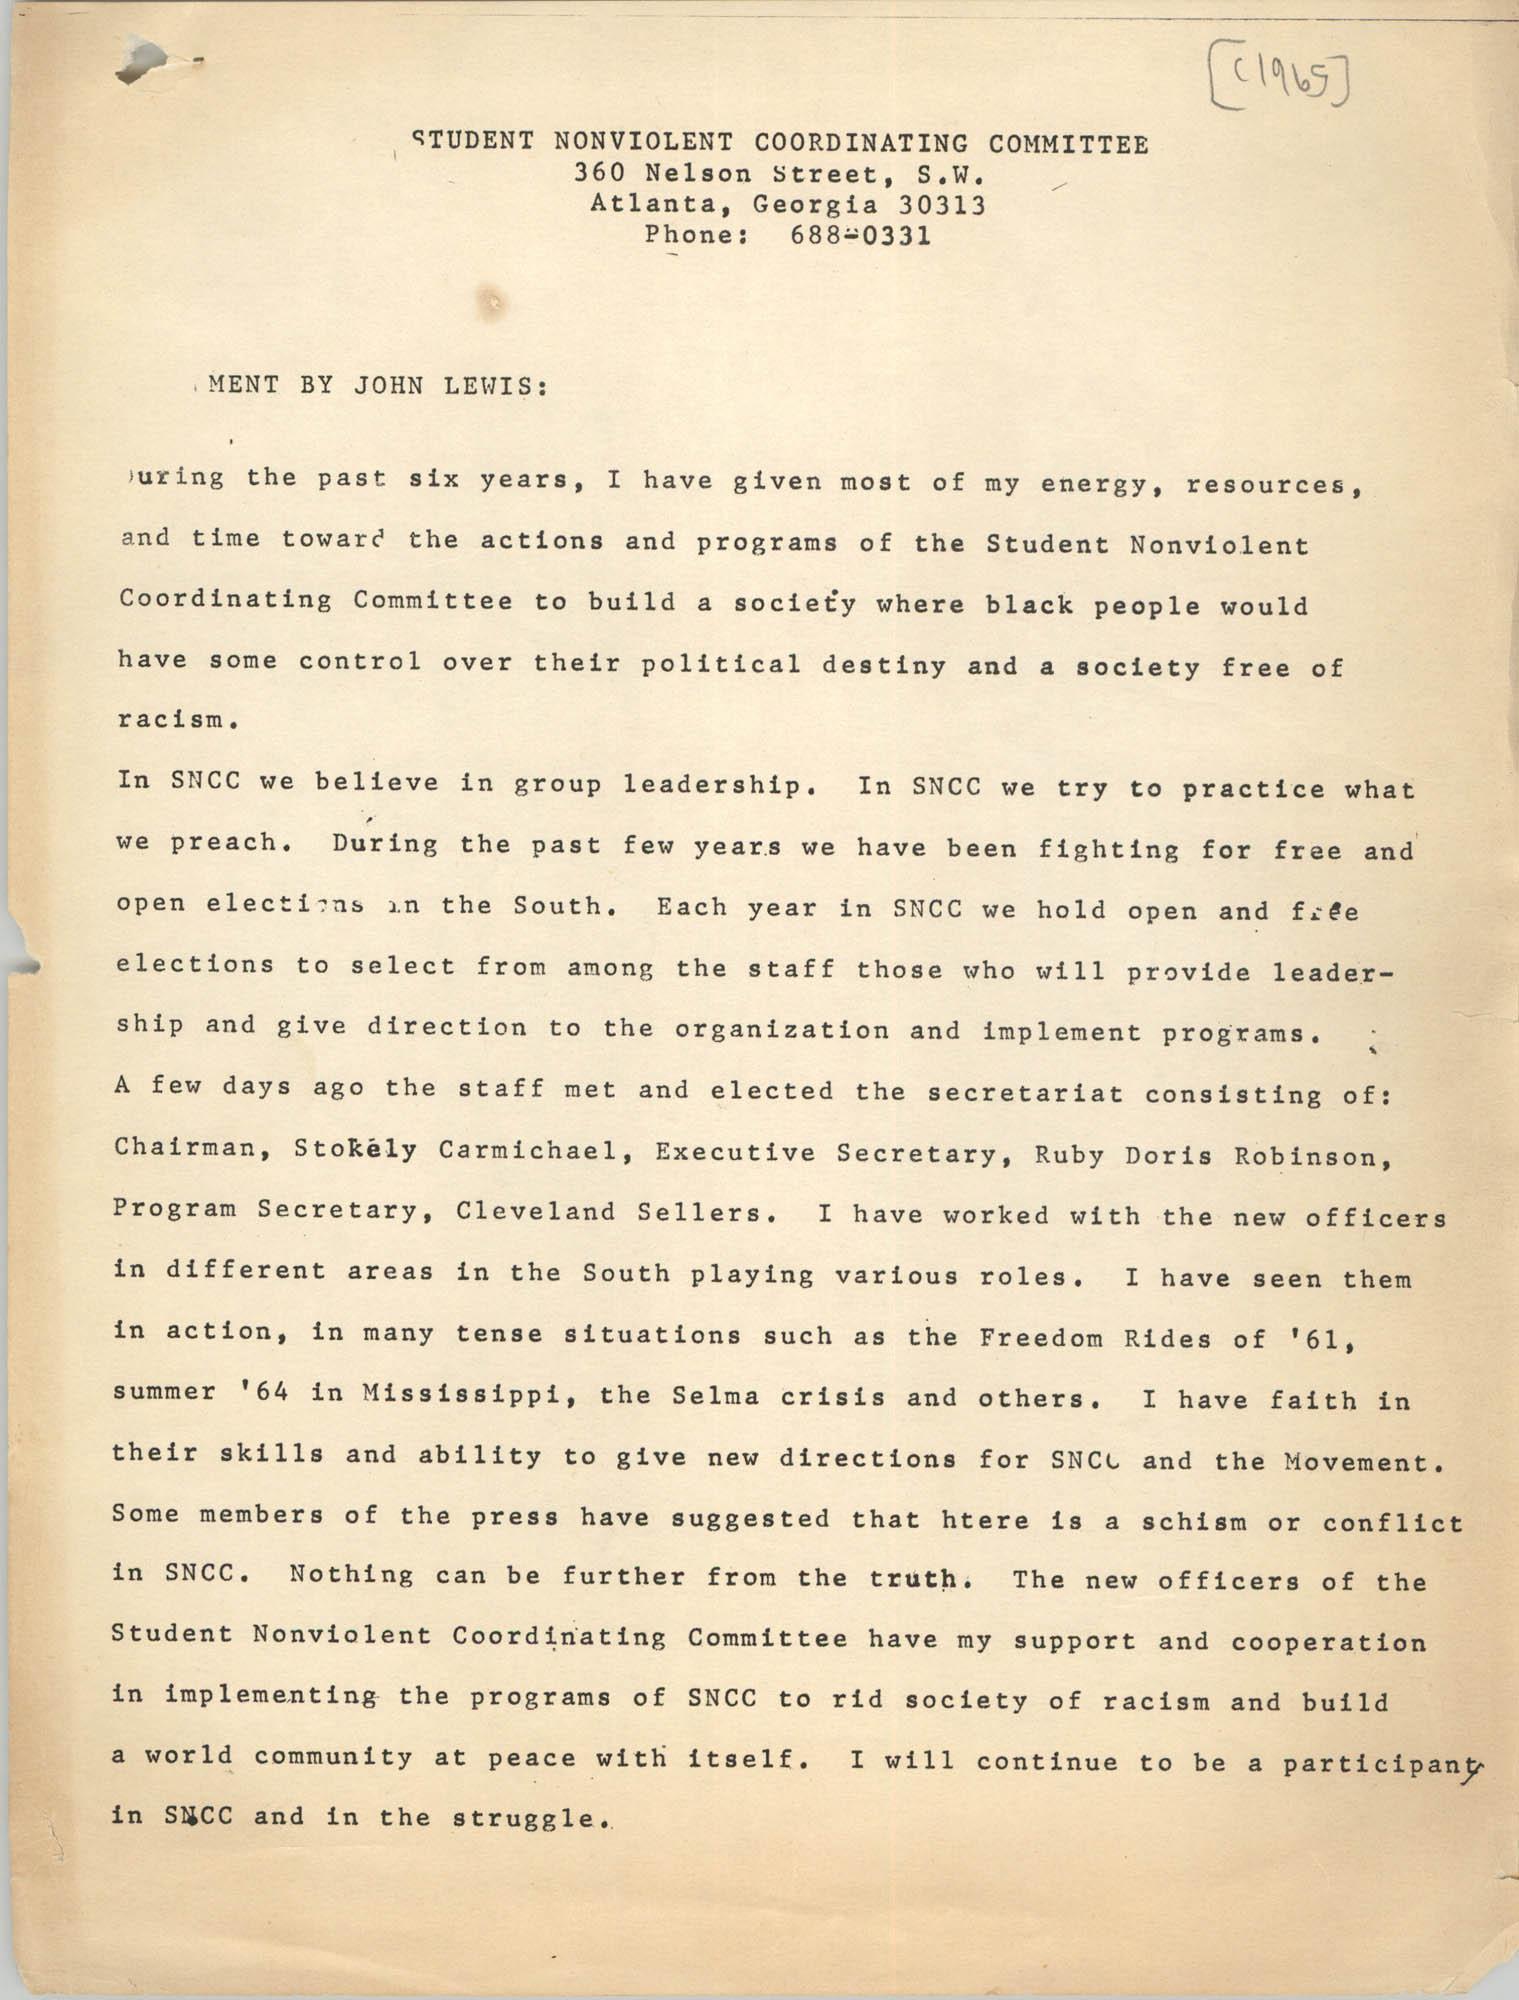 Statement by John Lewis, 1965